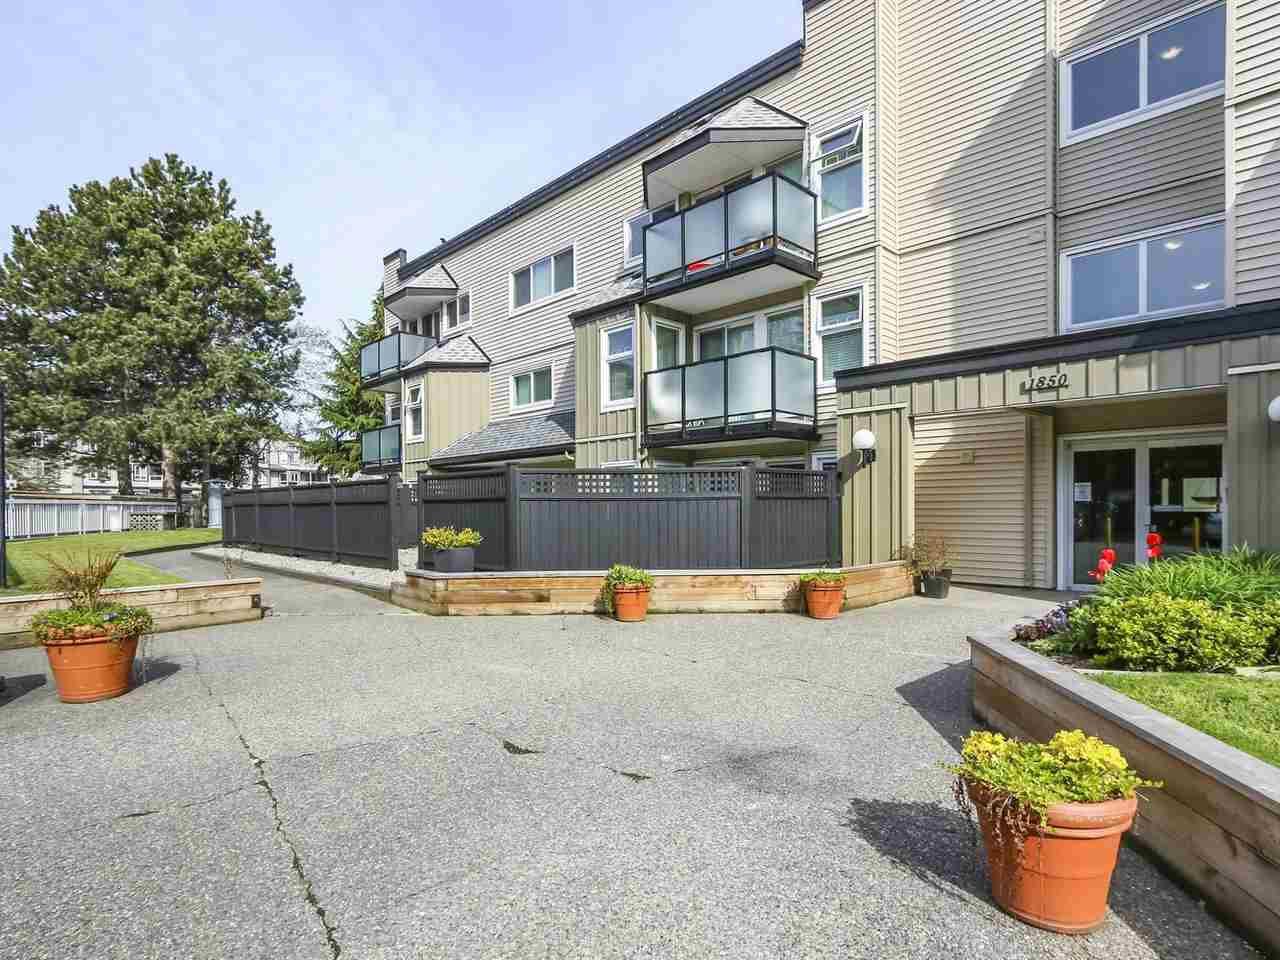 Main Photo: 109 1850 E SOUTHMERE Crescent in Surrey: Sunnyside Park Surrey Condo for sale (South Surrey White Rock)  : MLS®# R2359348